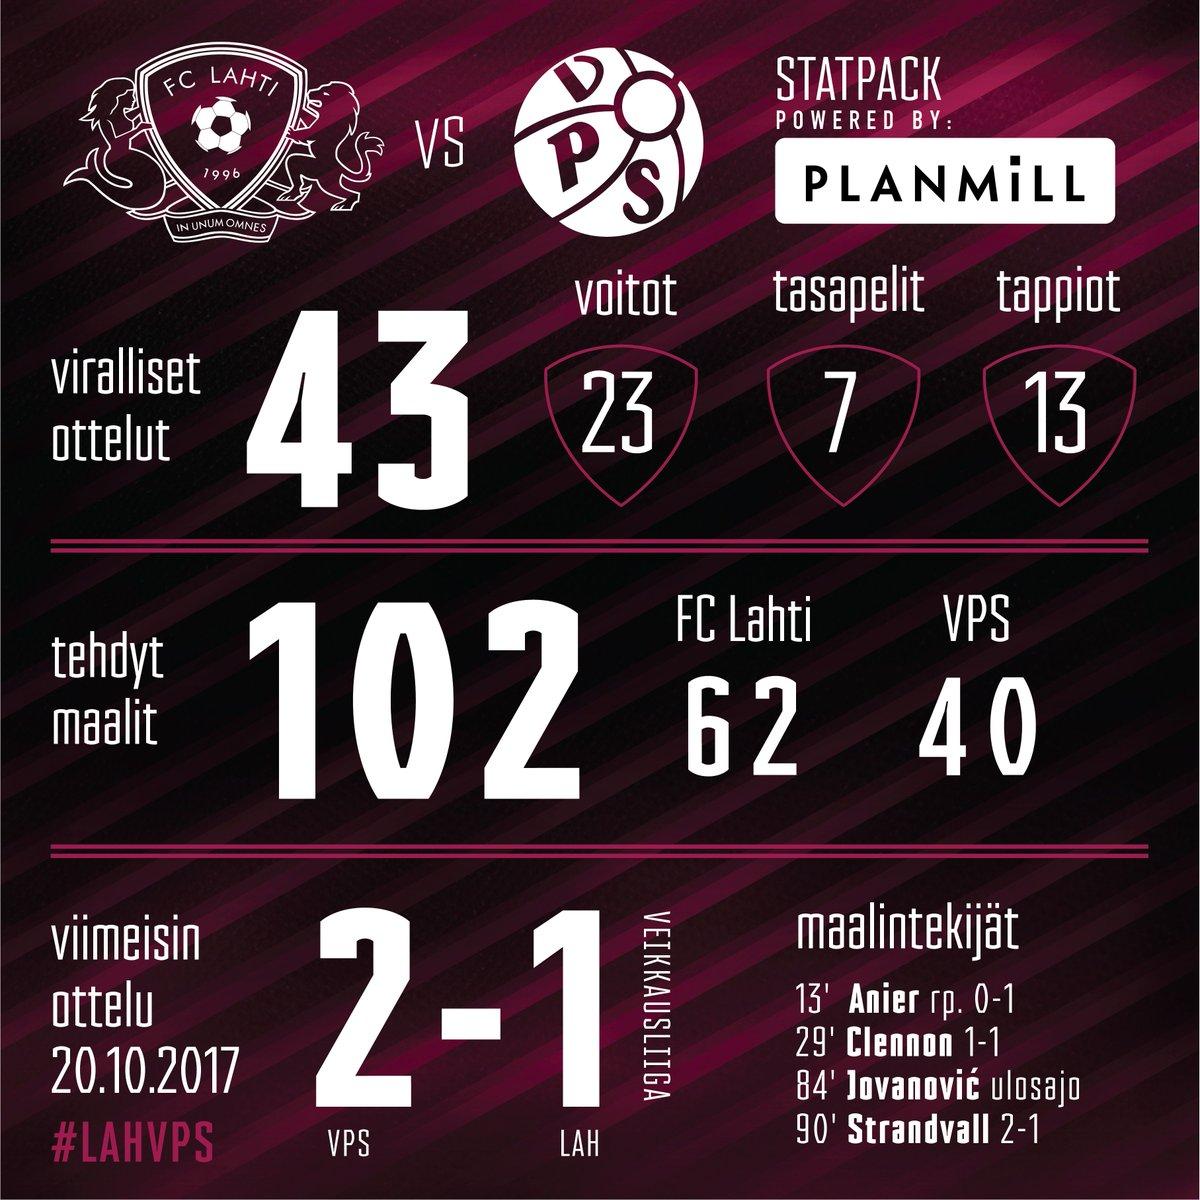 FC Lahti - Twitter